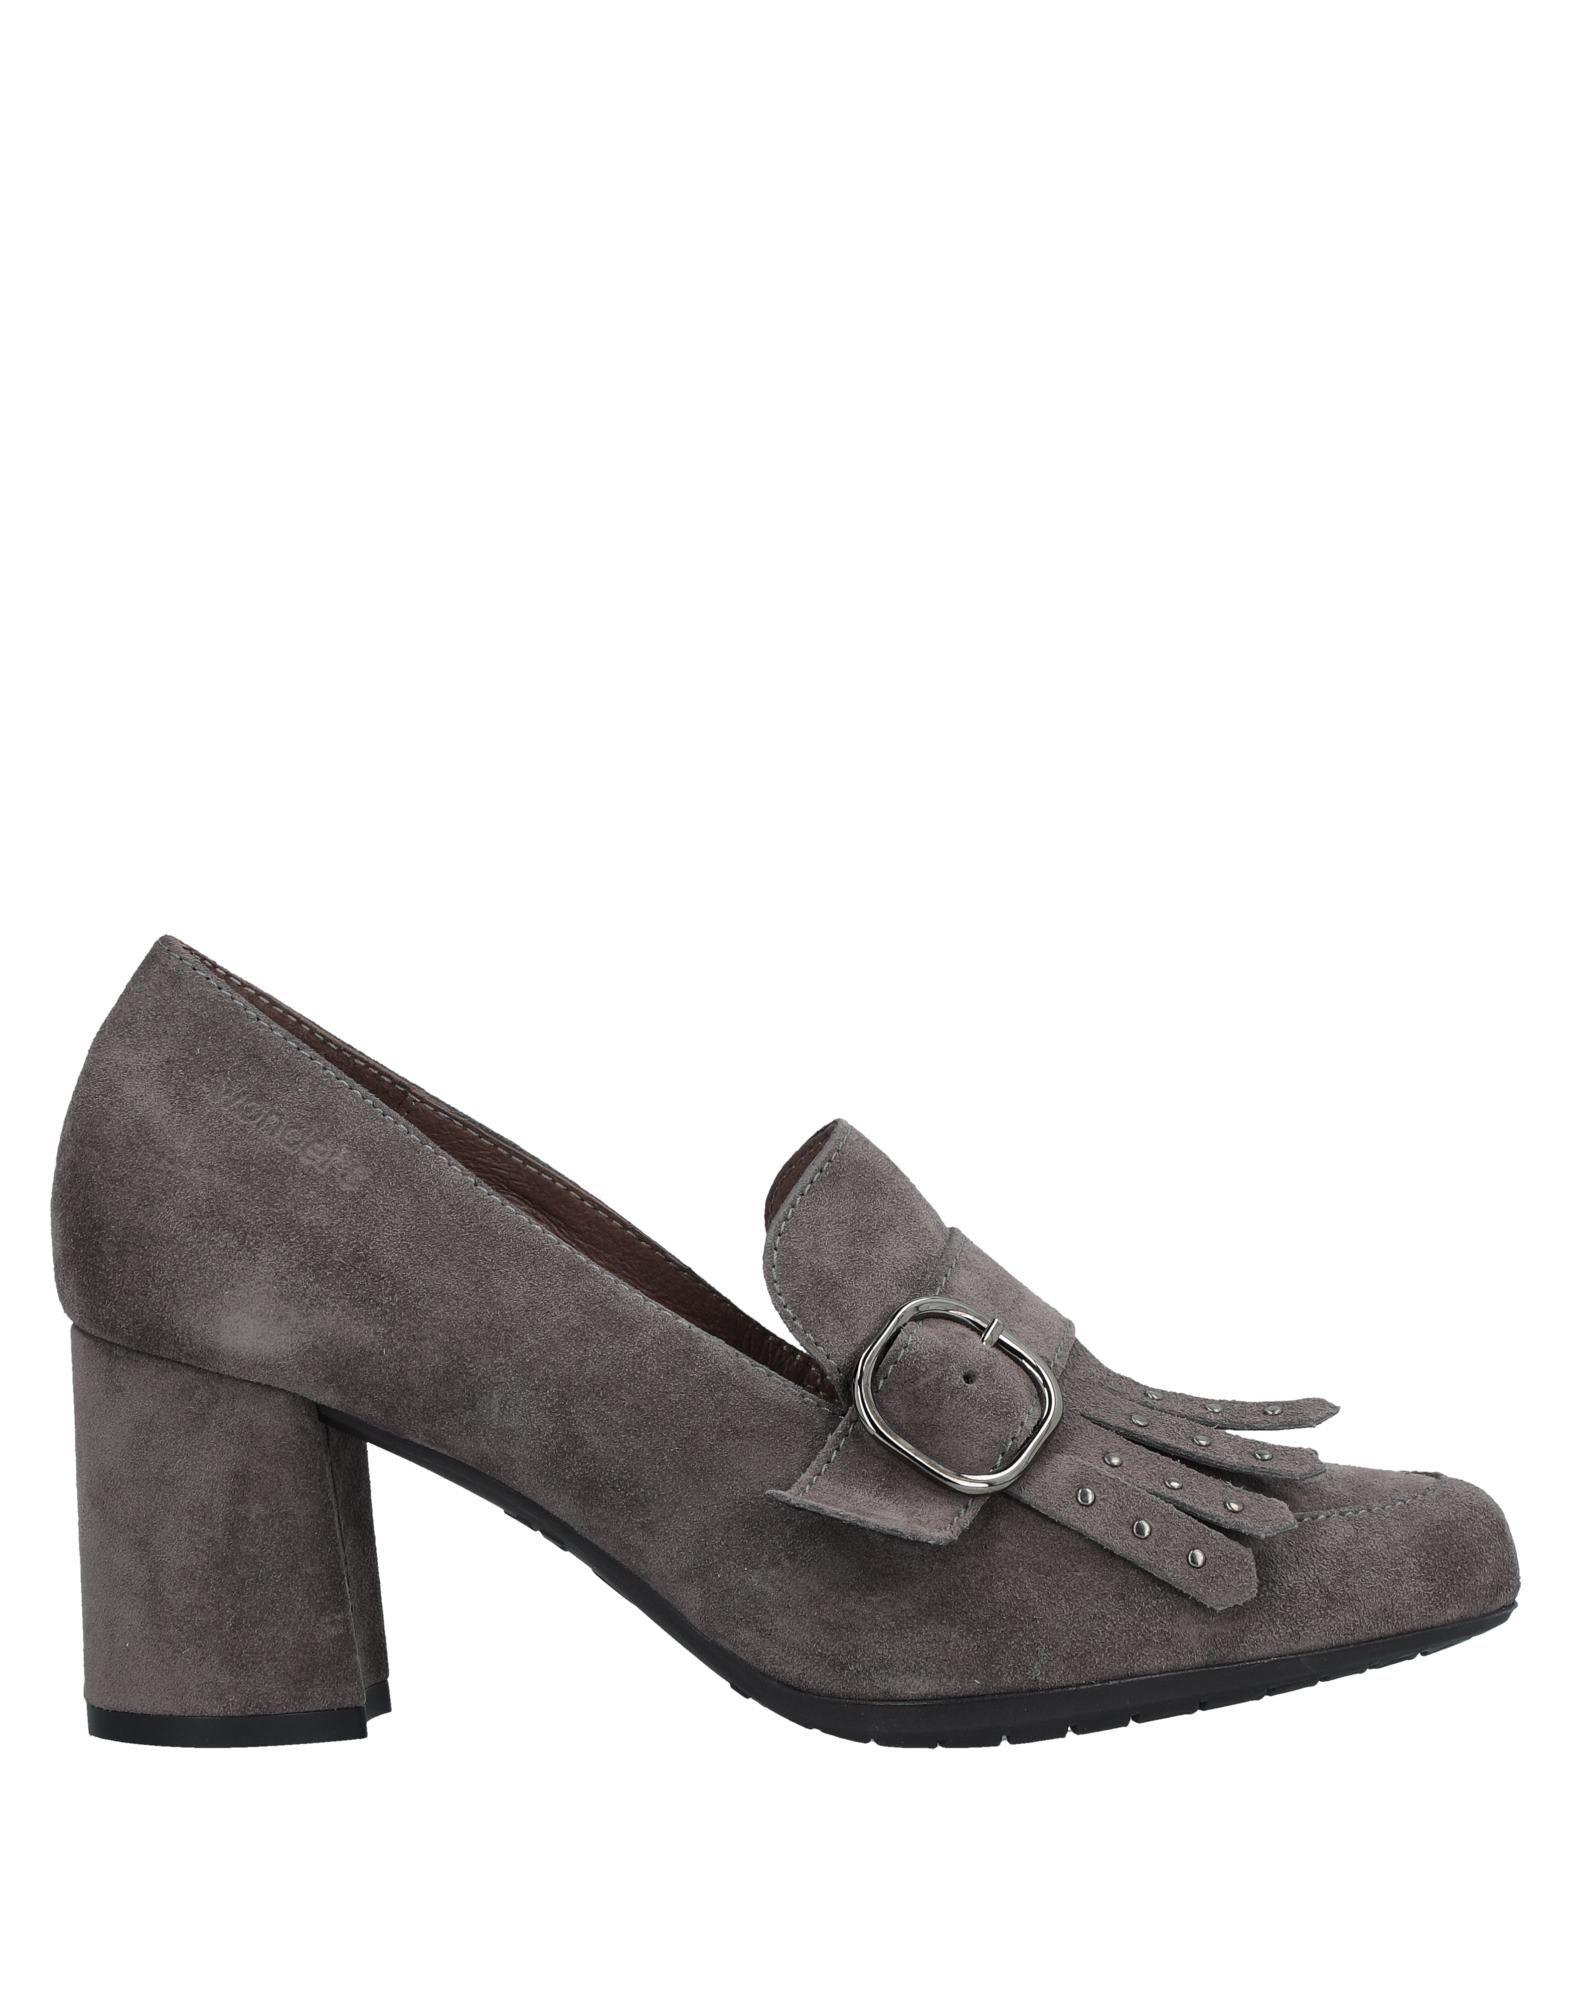 Wonders Loafers - Women Wonders Loafers online 11532634UB on  Australia - 11532634UB online c149f5